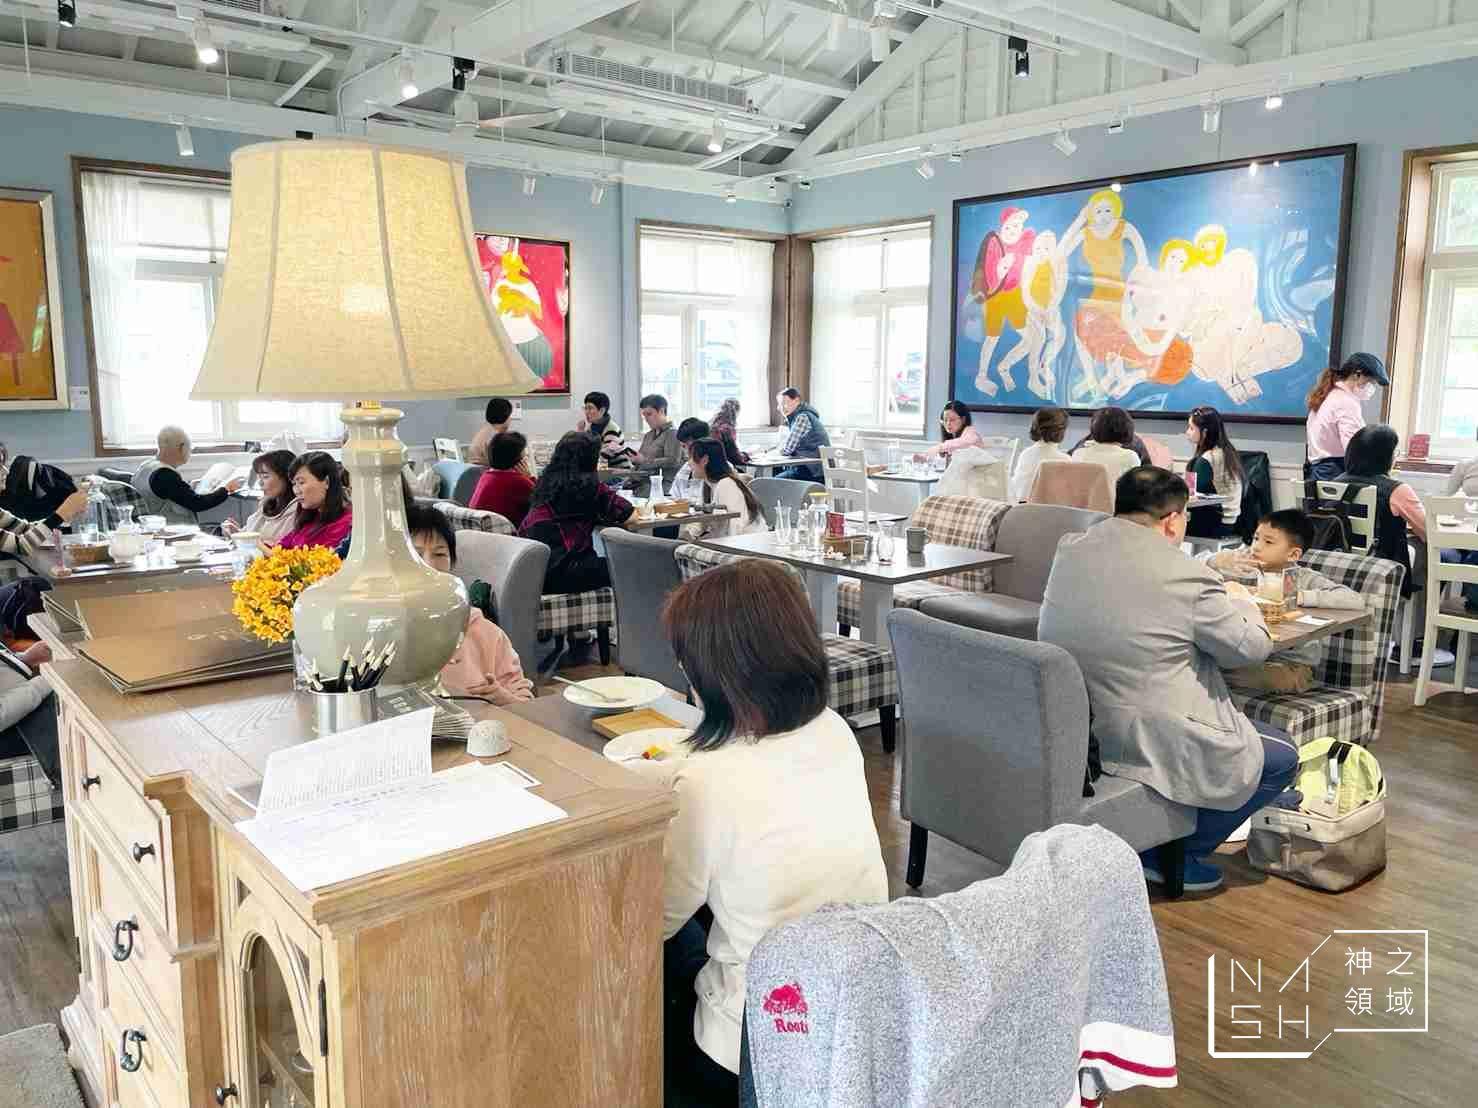 The Cafe By 想陽明山